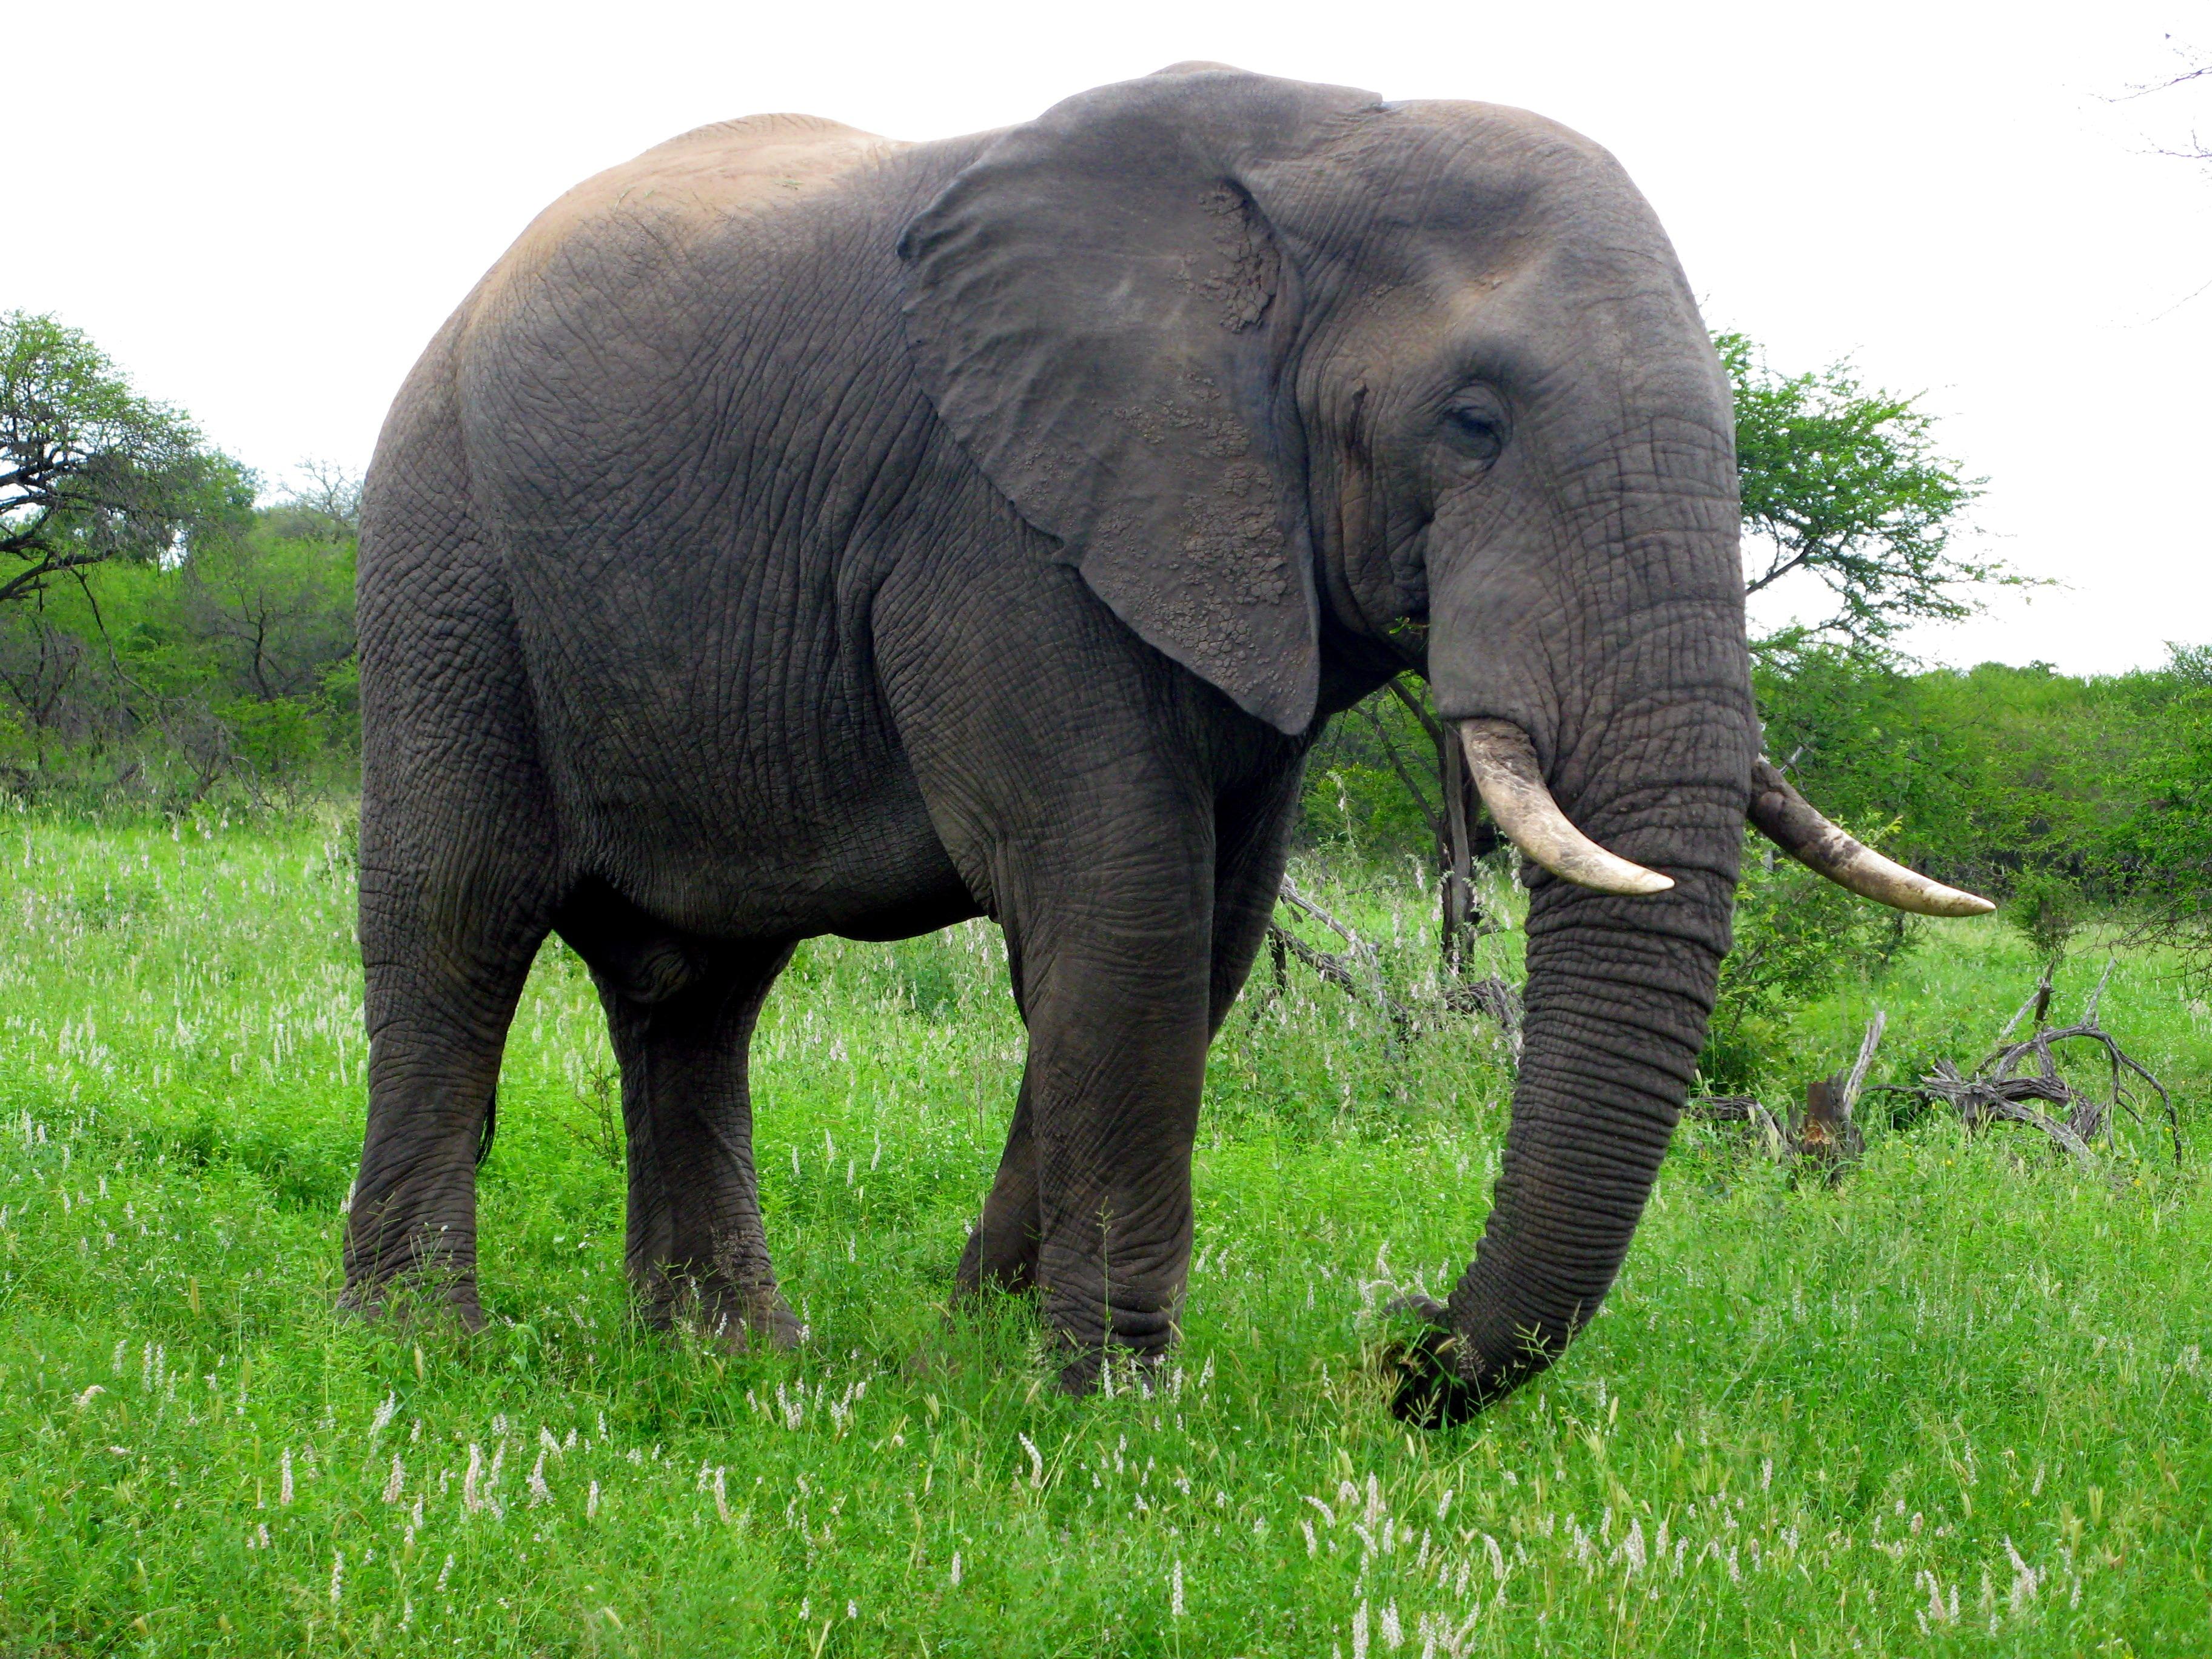 elephant animal fauna indian grassland elephants africa african mammal safari wildlife vertebrate mammoths domain pxhere